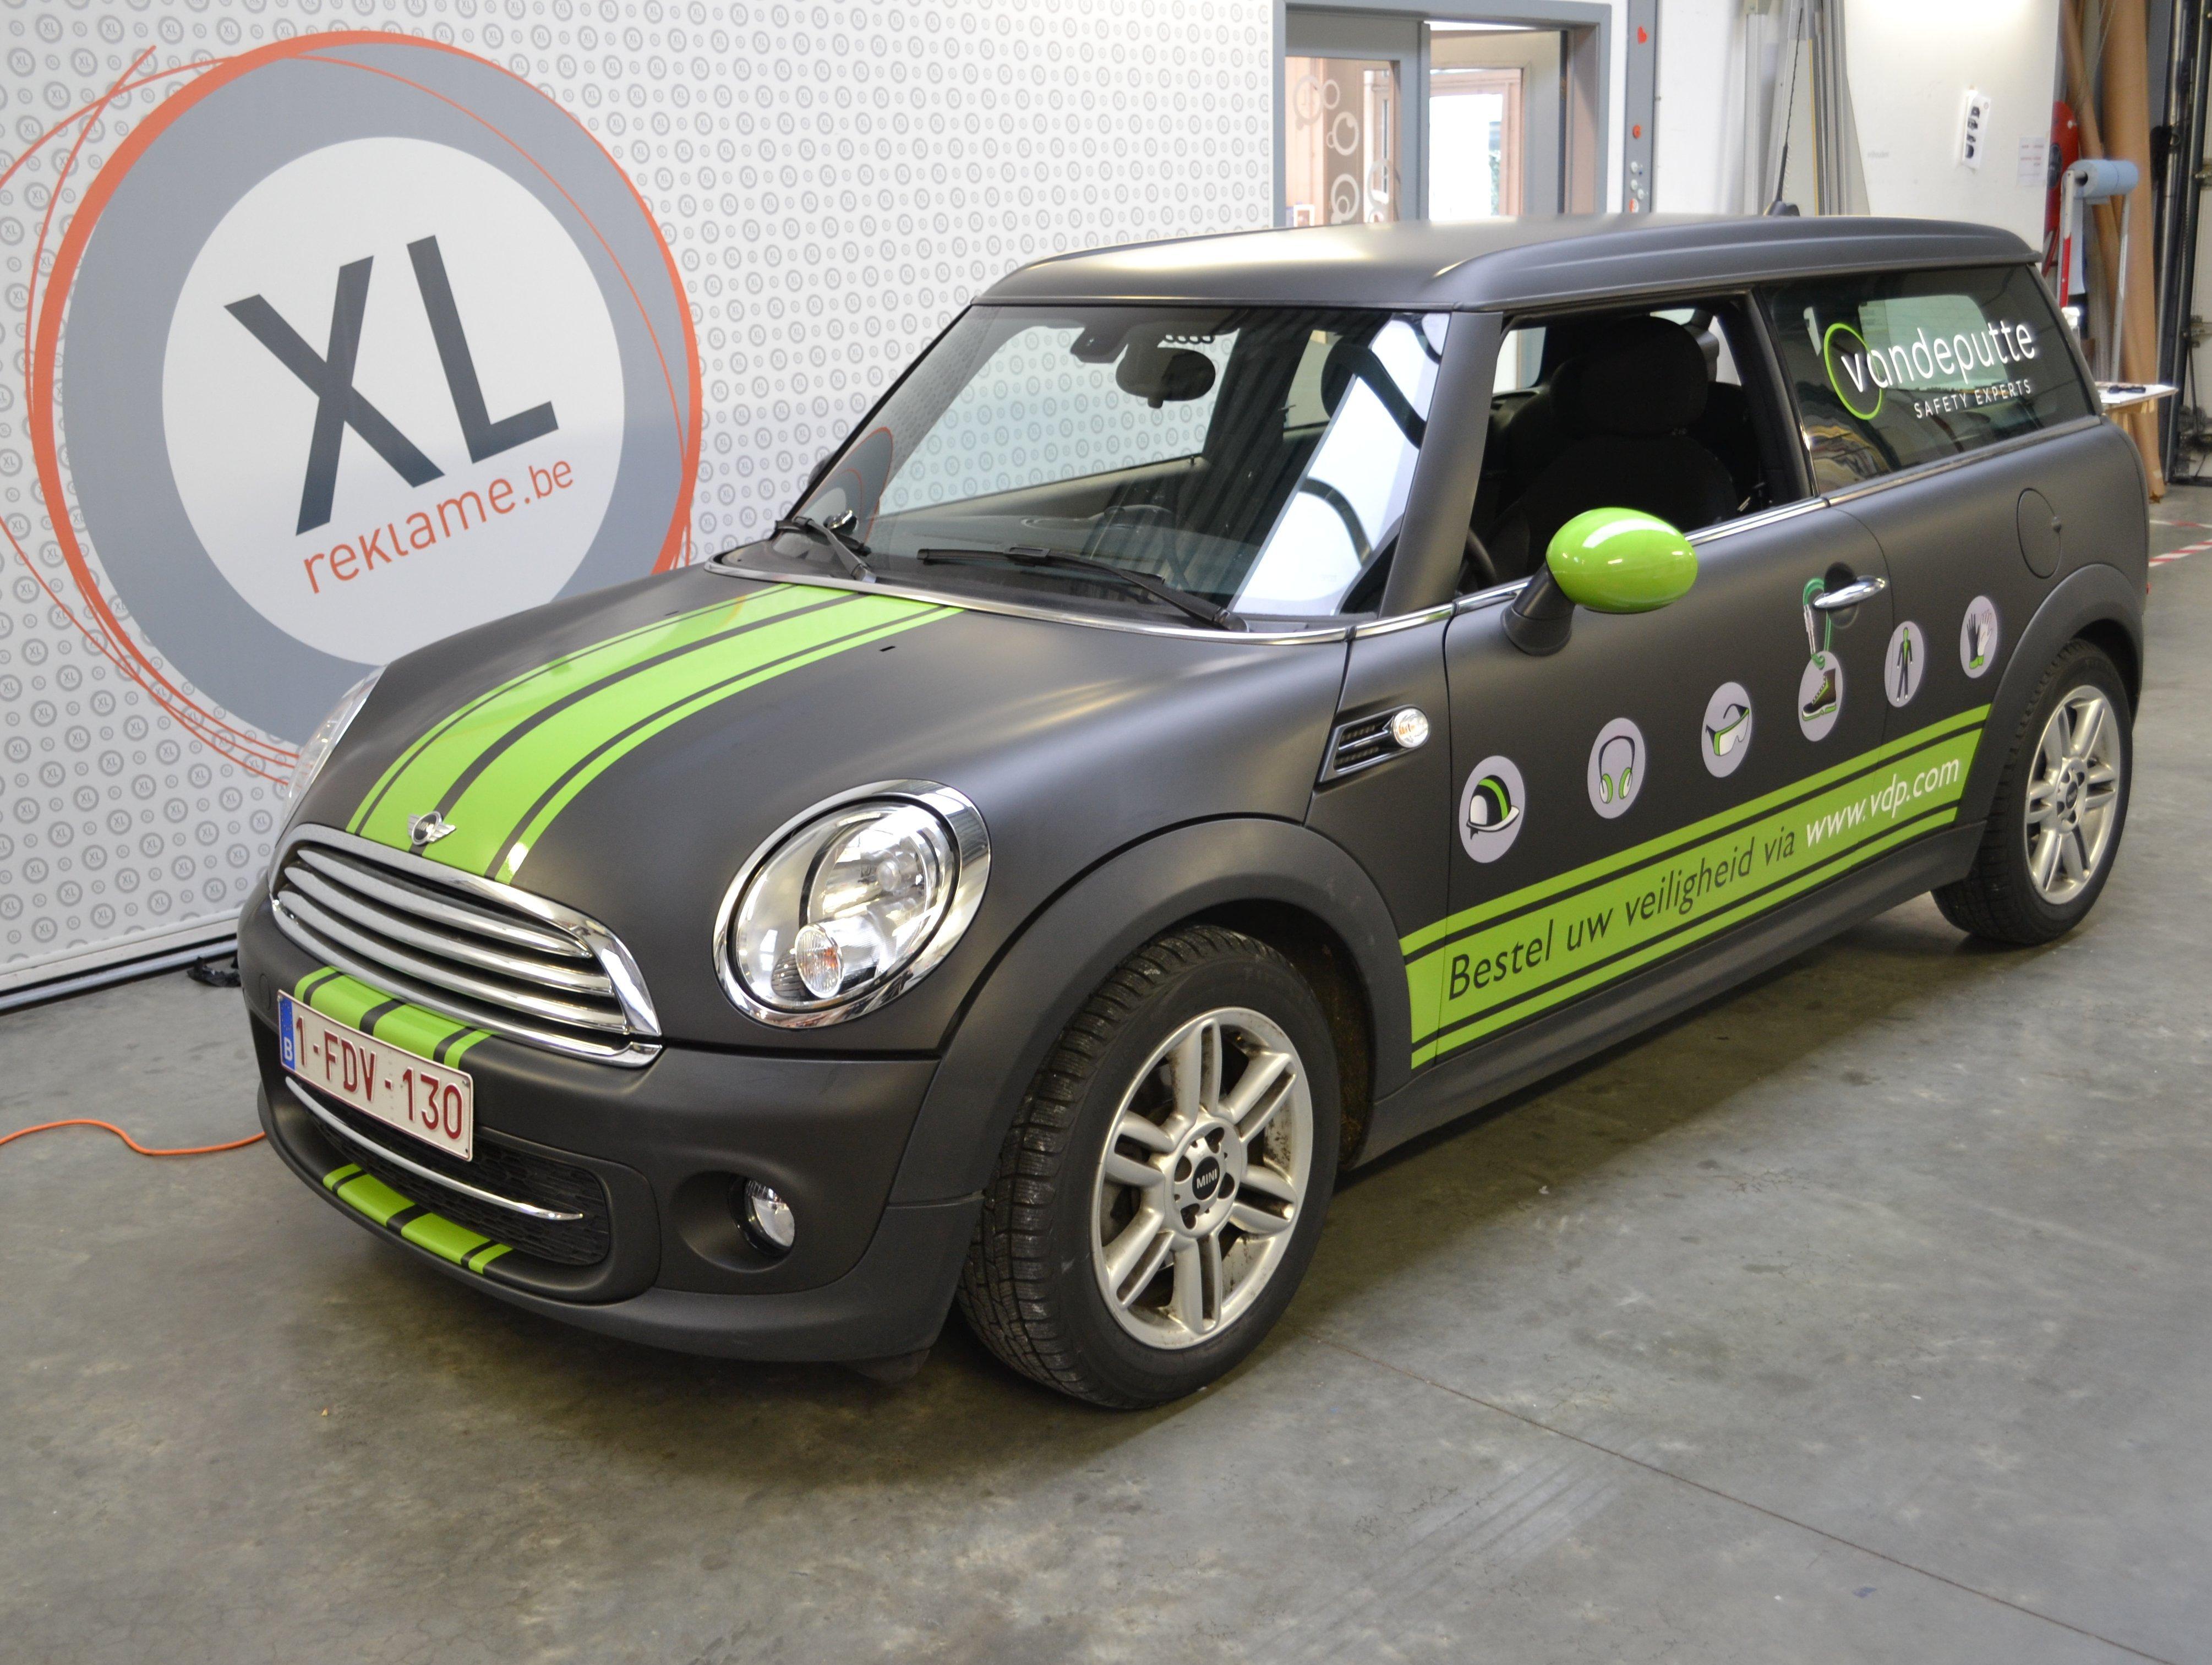 Autobelettering - Wagenpark